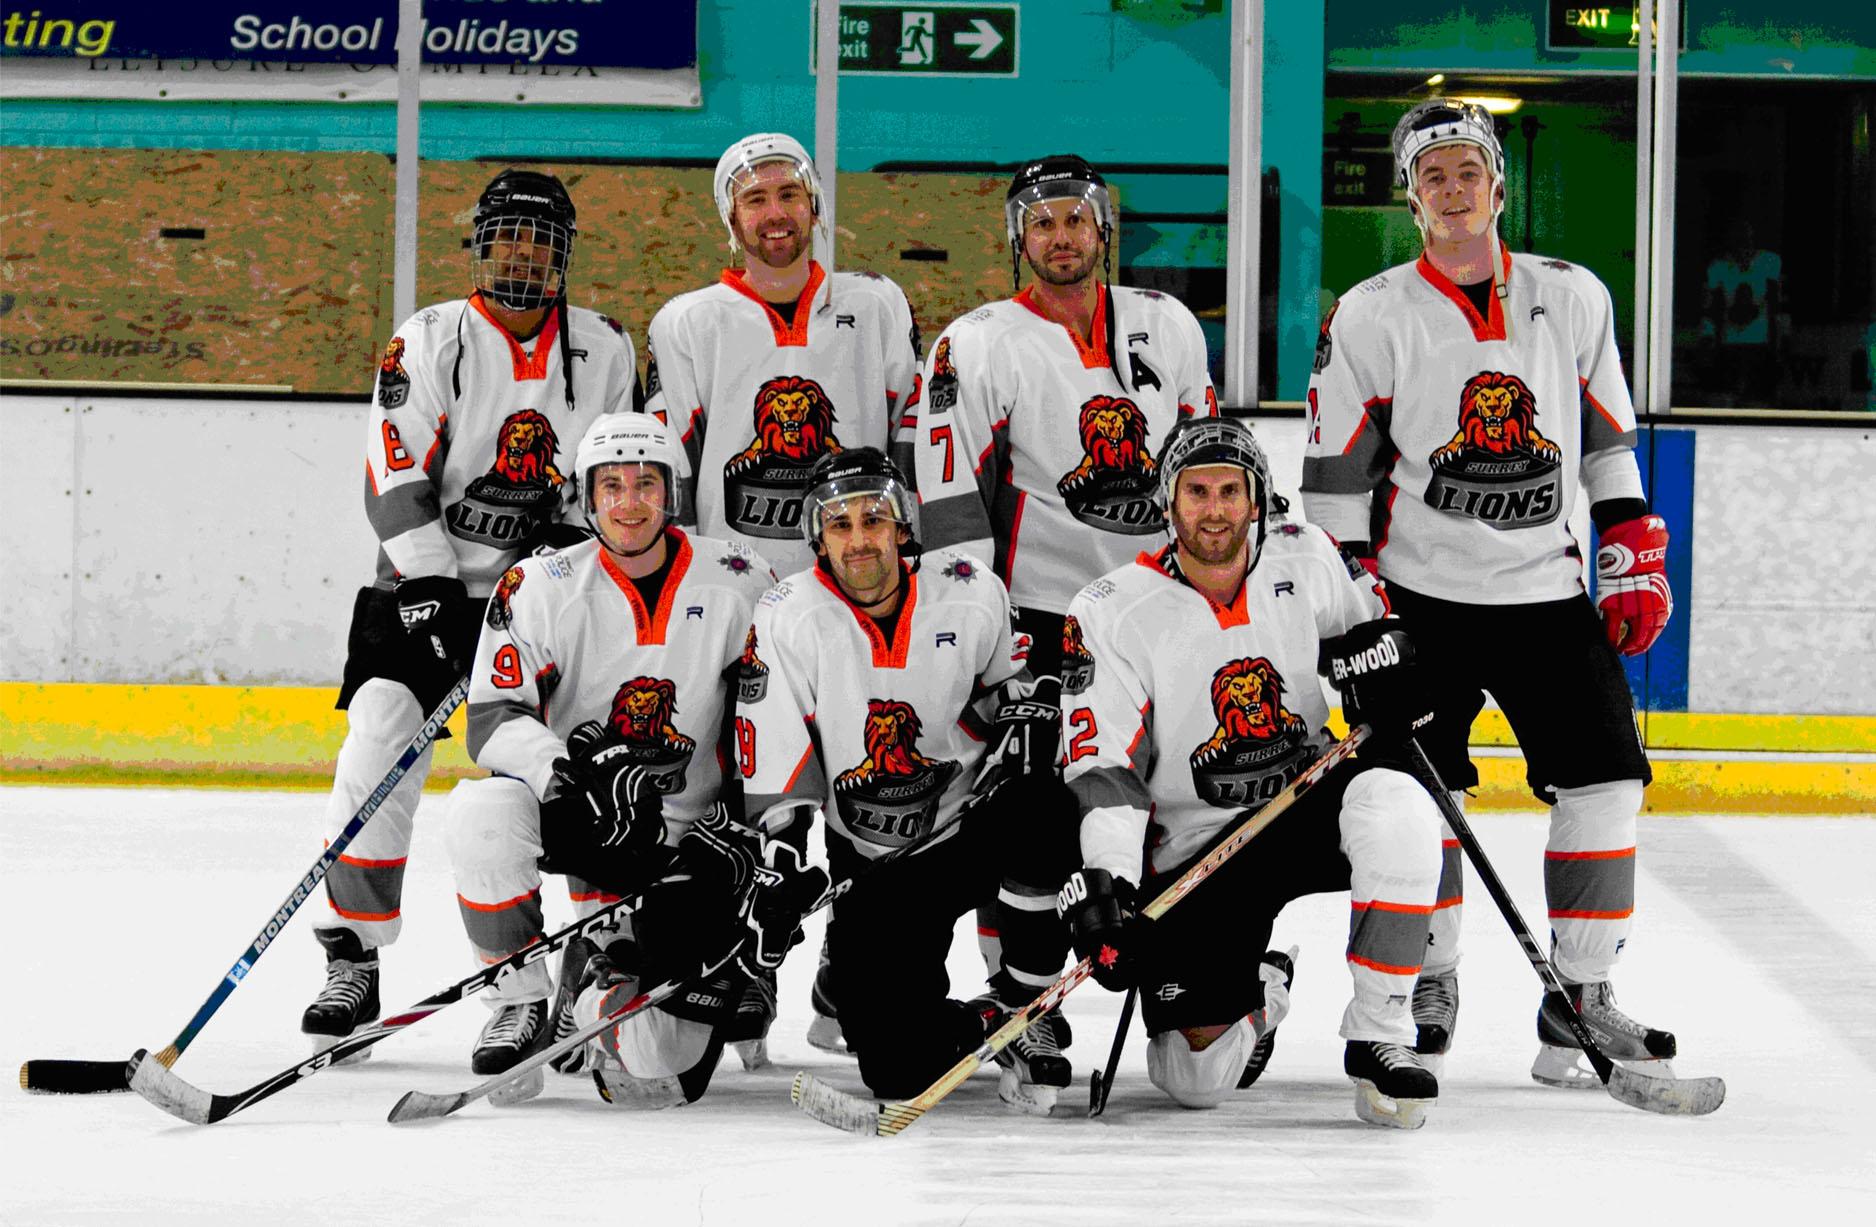 surrey lions ice hockey team runnymede residents community web site